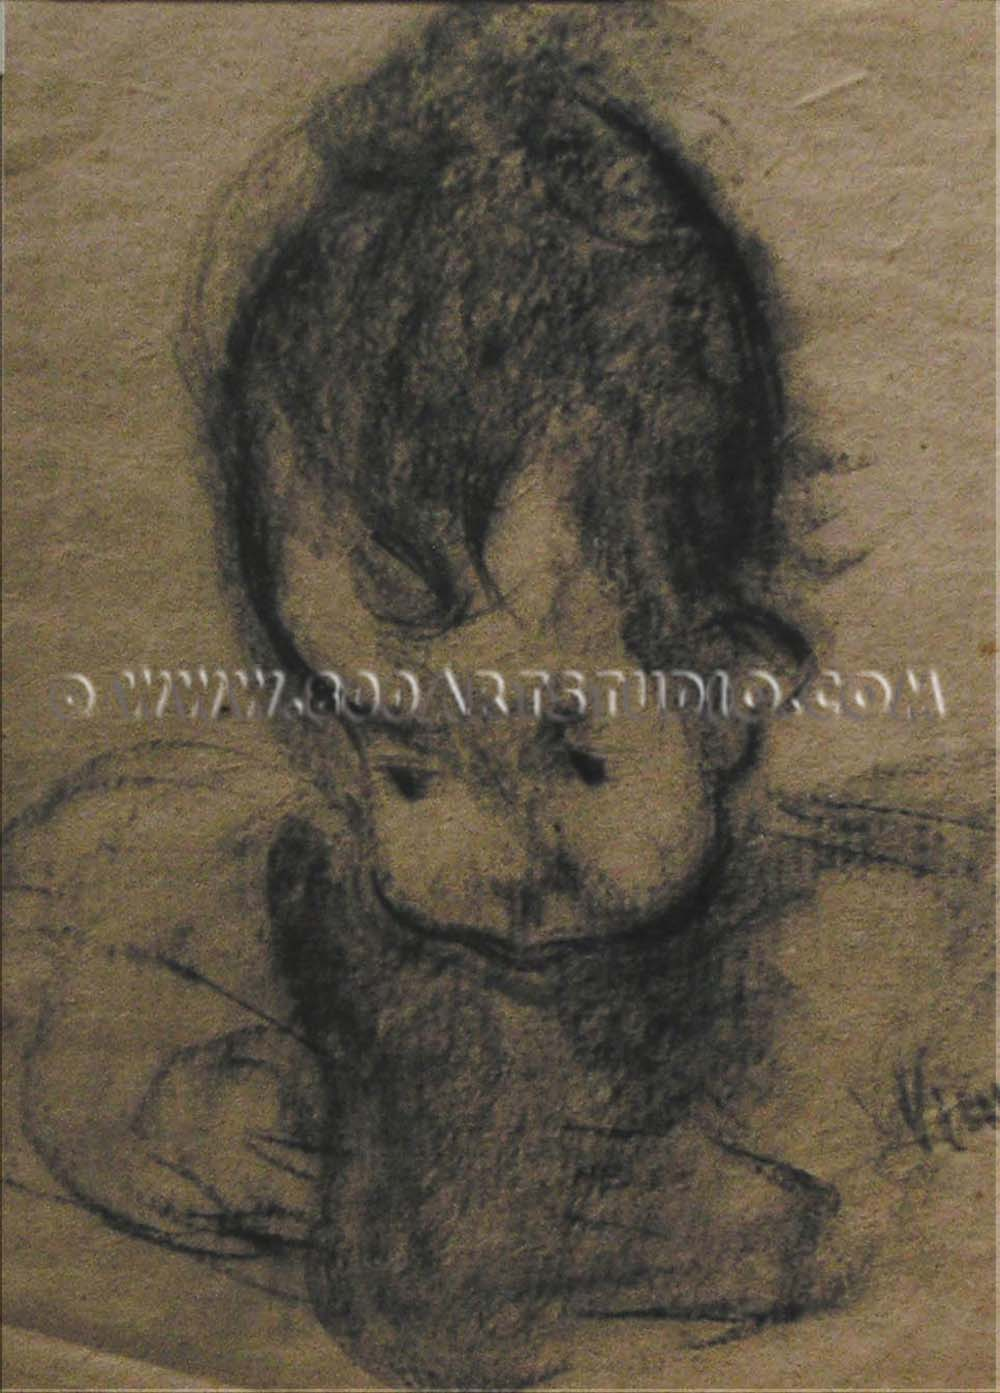 Lorenzo Viani - Testa di fanciullo